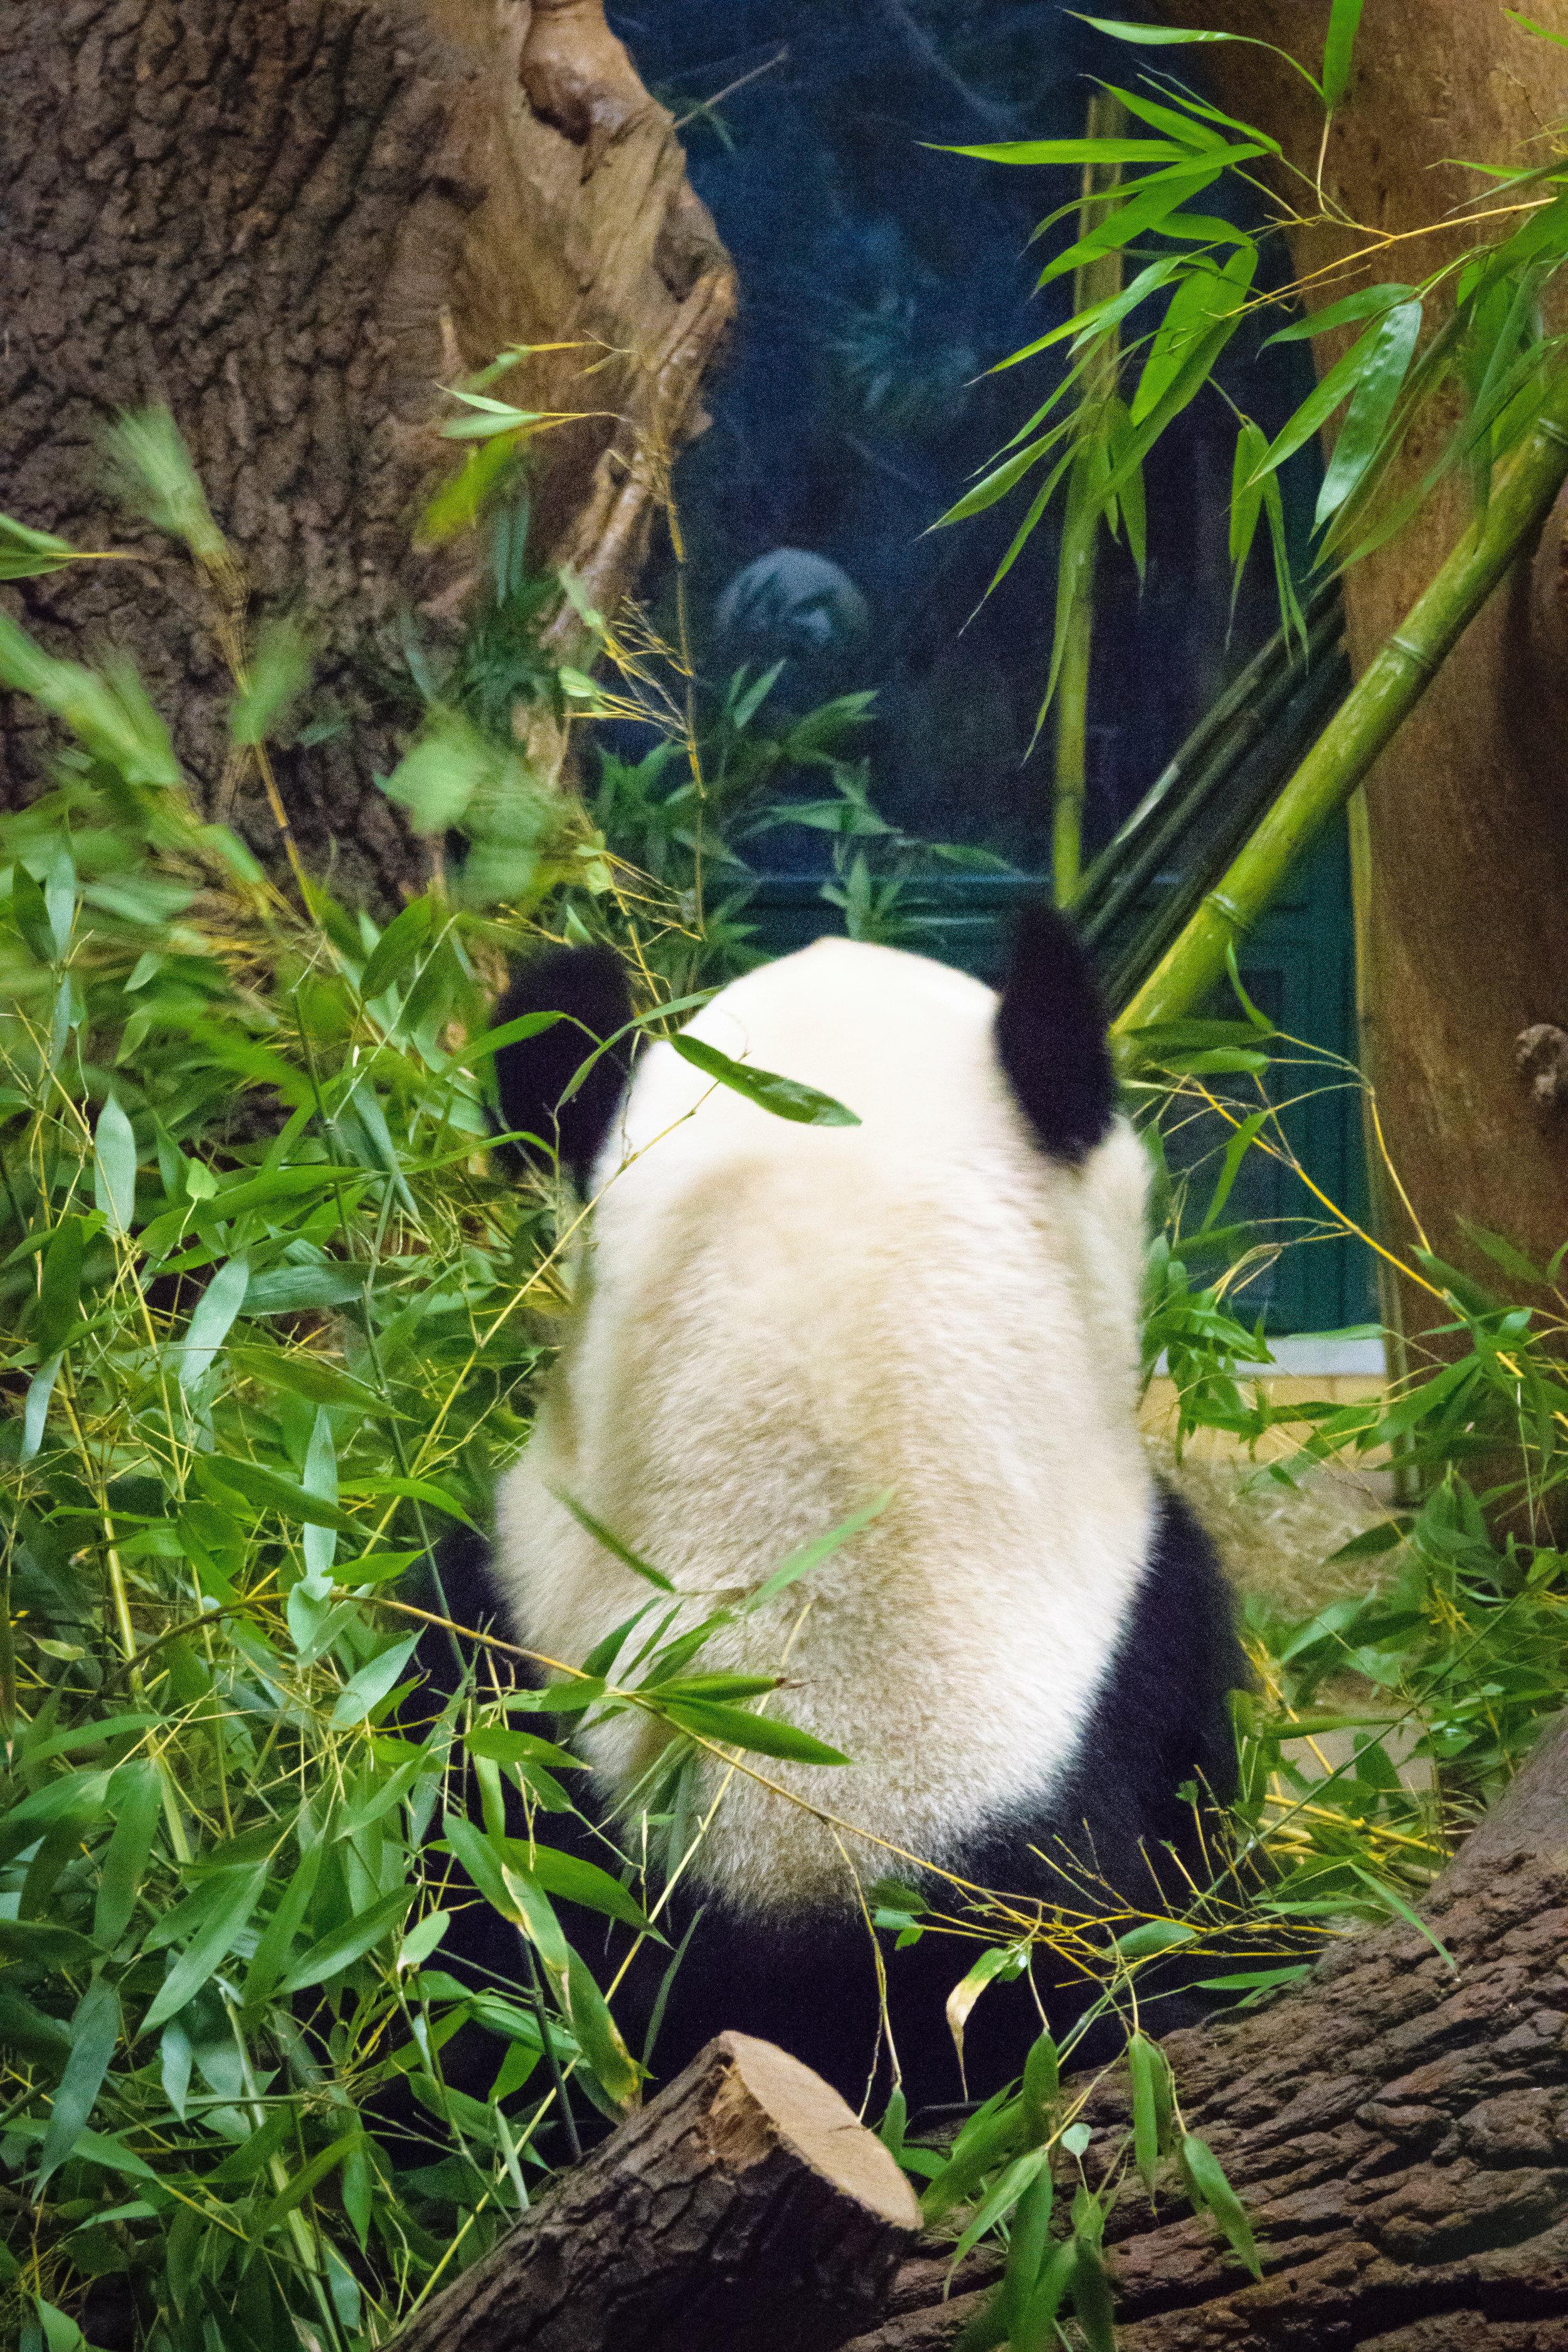 the backside of a sad panda